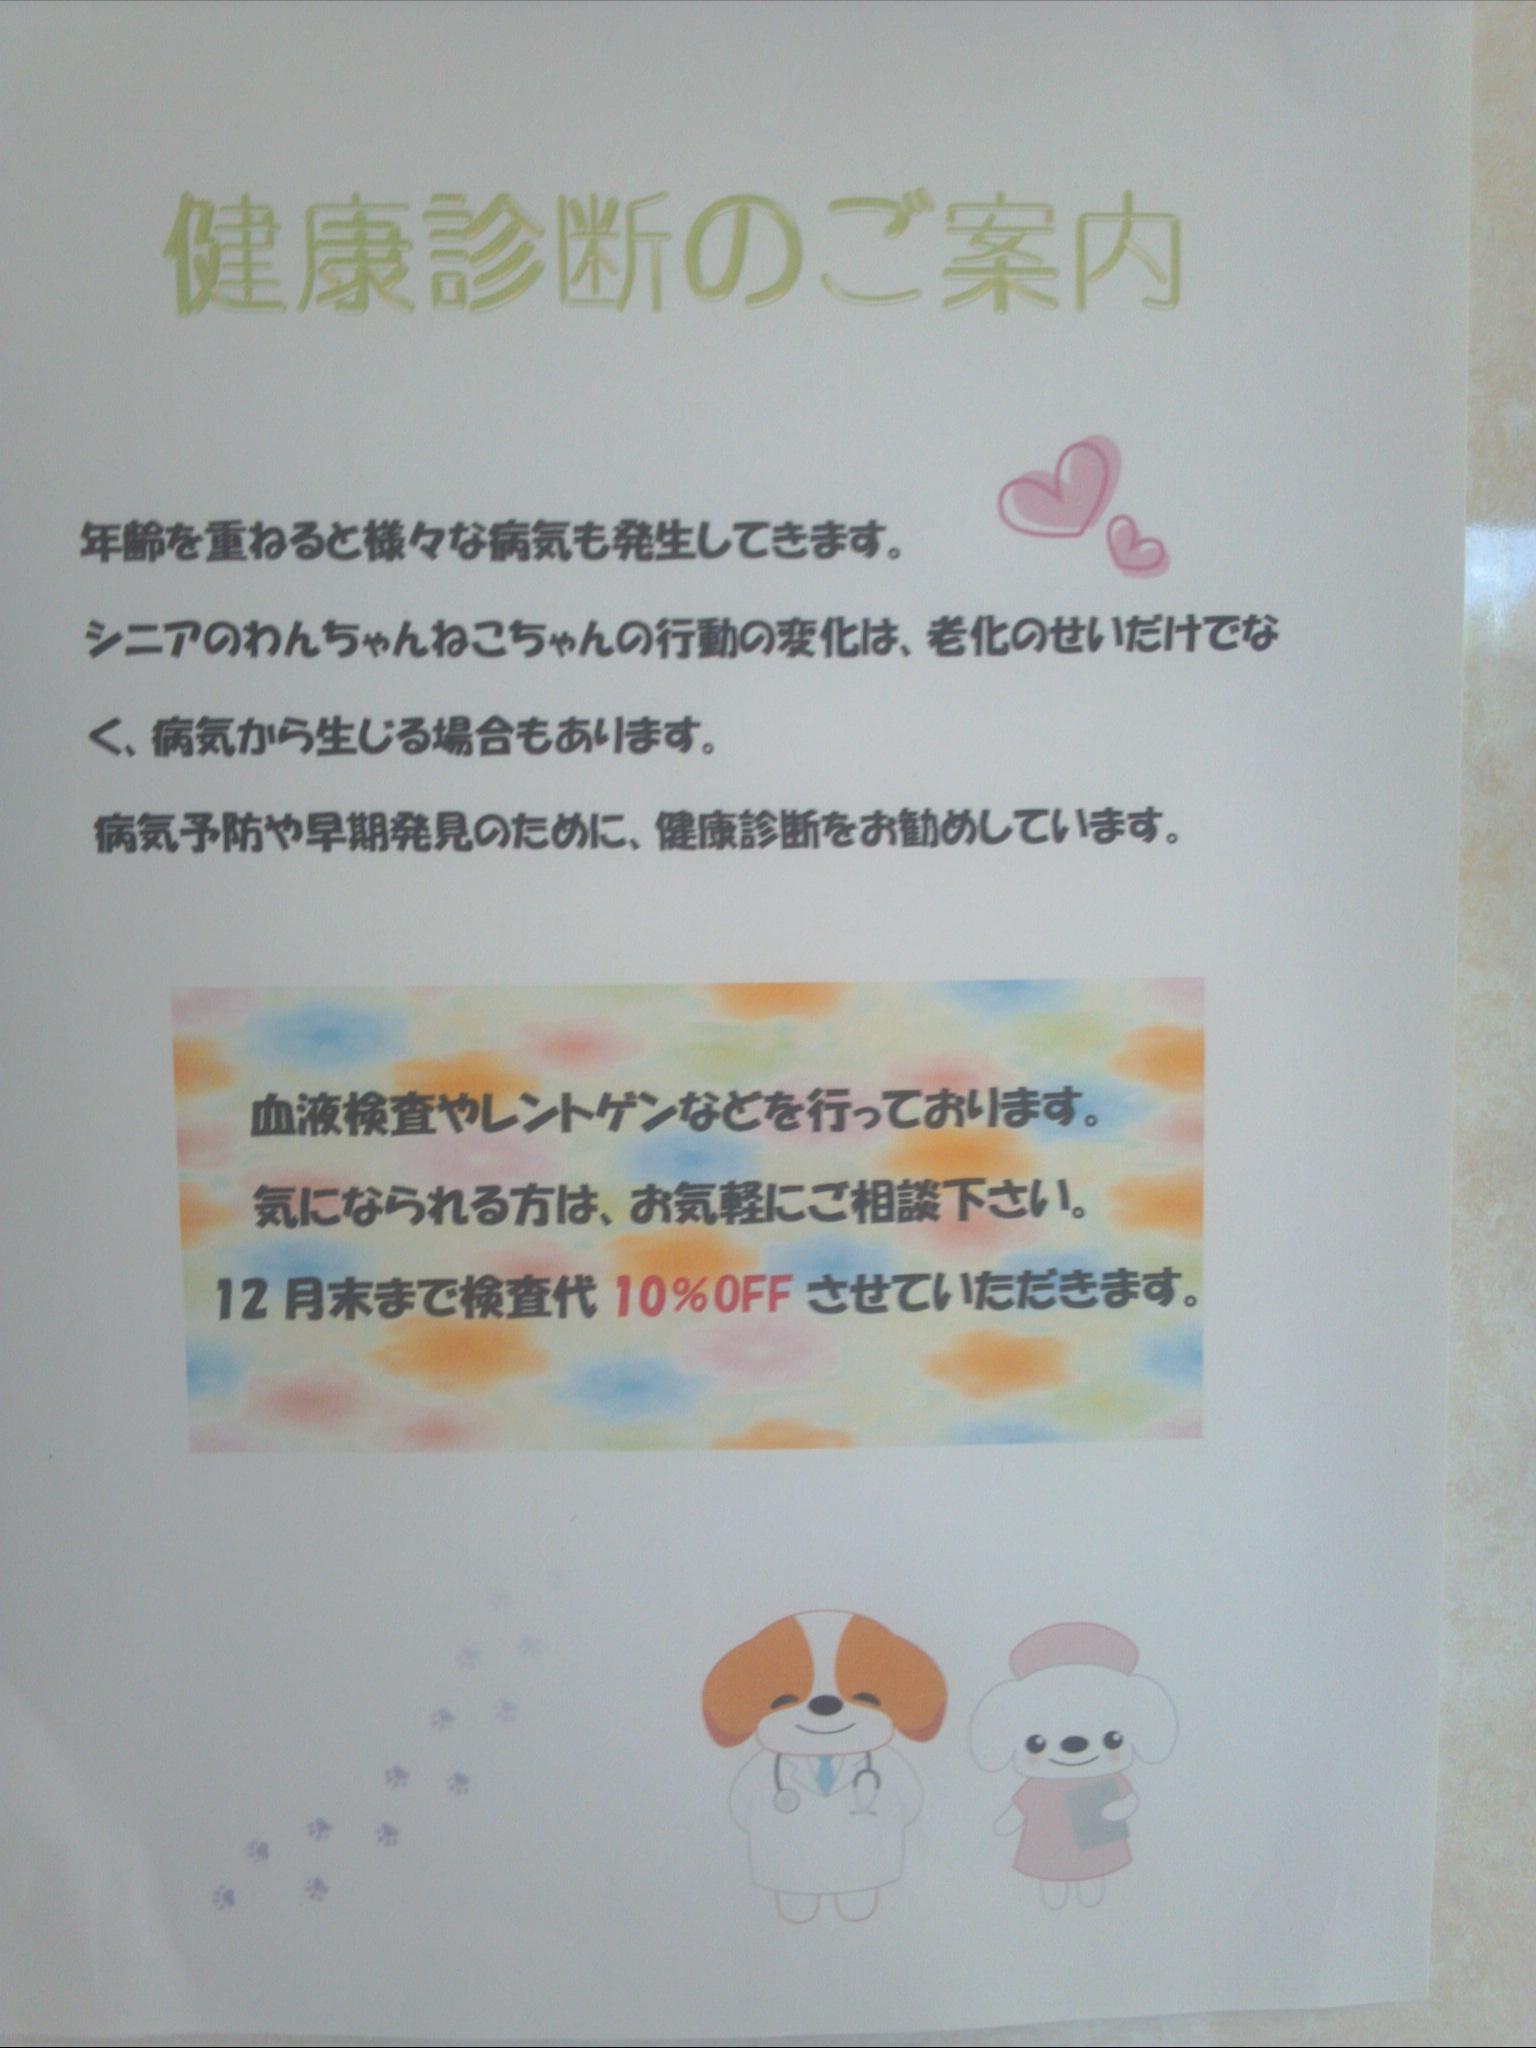 2014-11-19_08-51-43_998